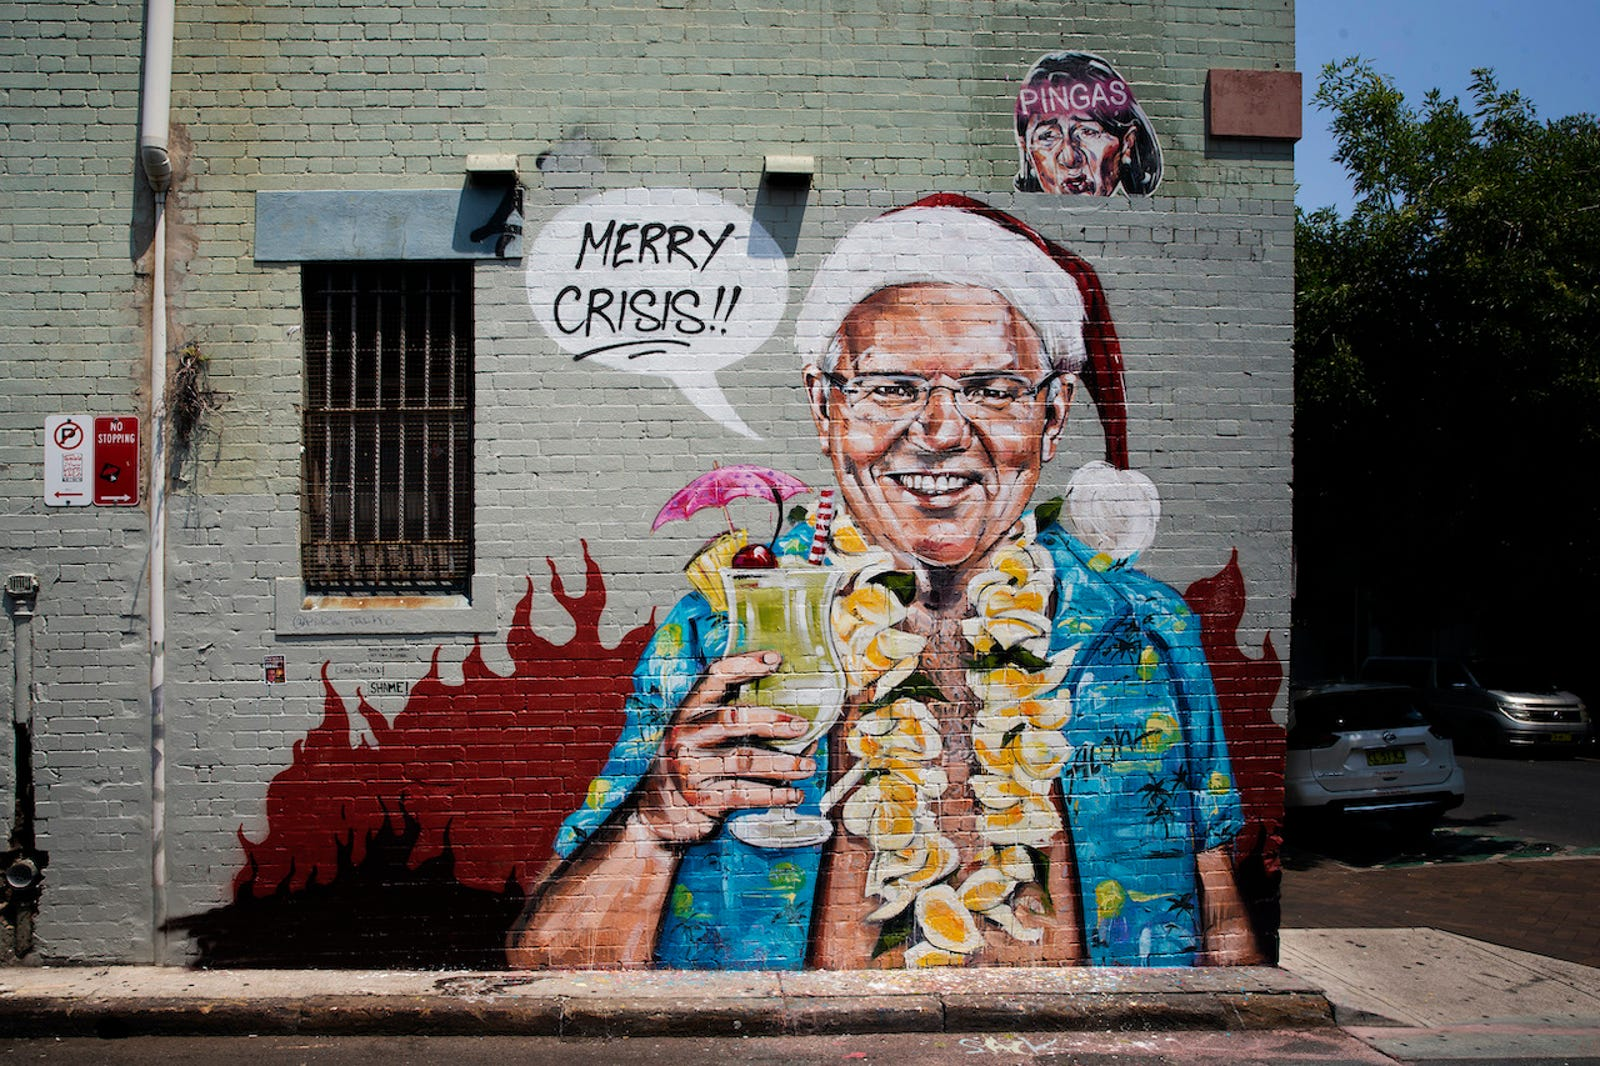 A mural by artist Scott Marsh depicting Prime Minister Scott Morrison on vacation in Hawaii is seen on December 26, 2019 in Sydney, Australia.